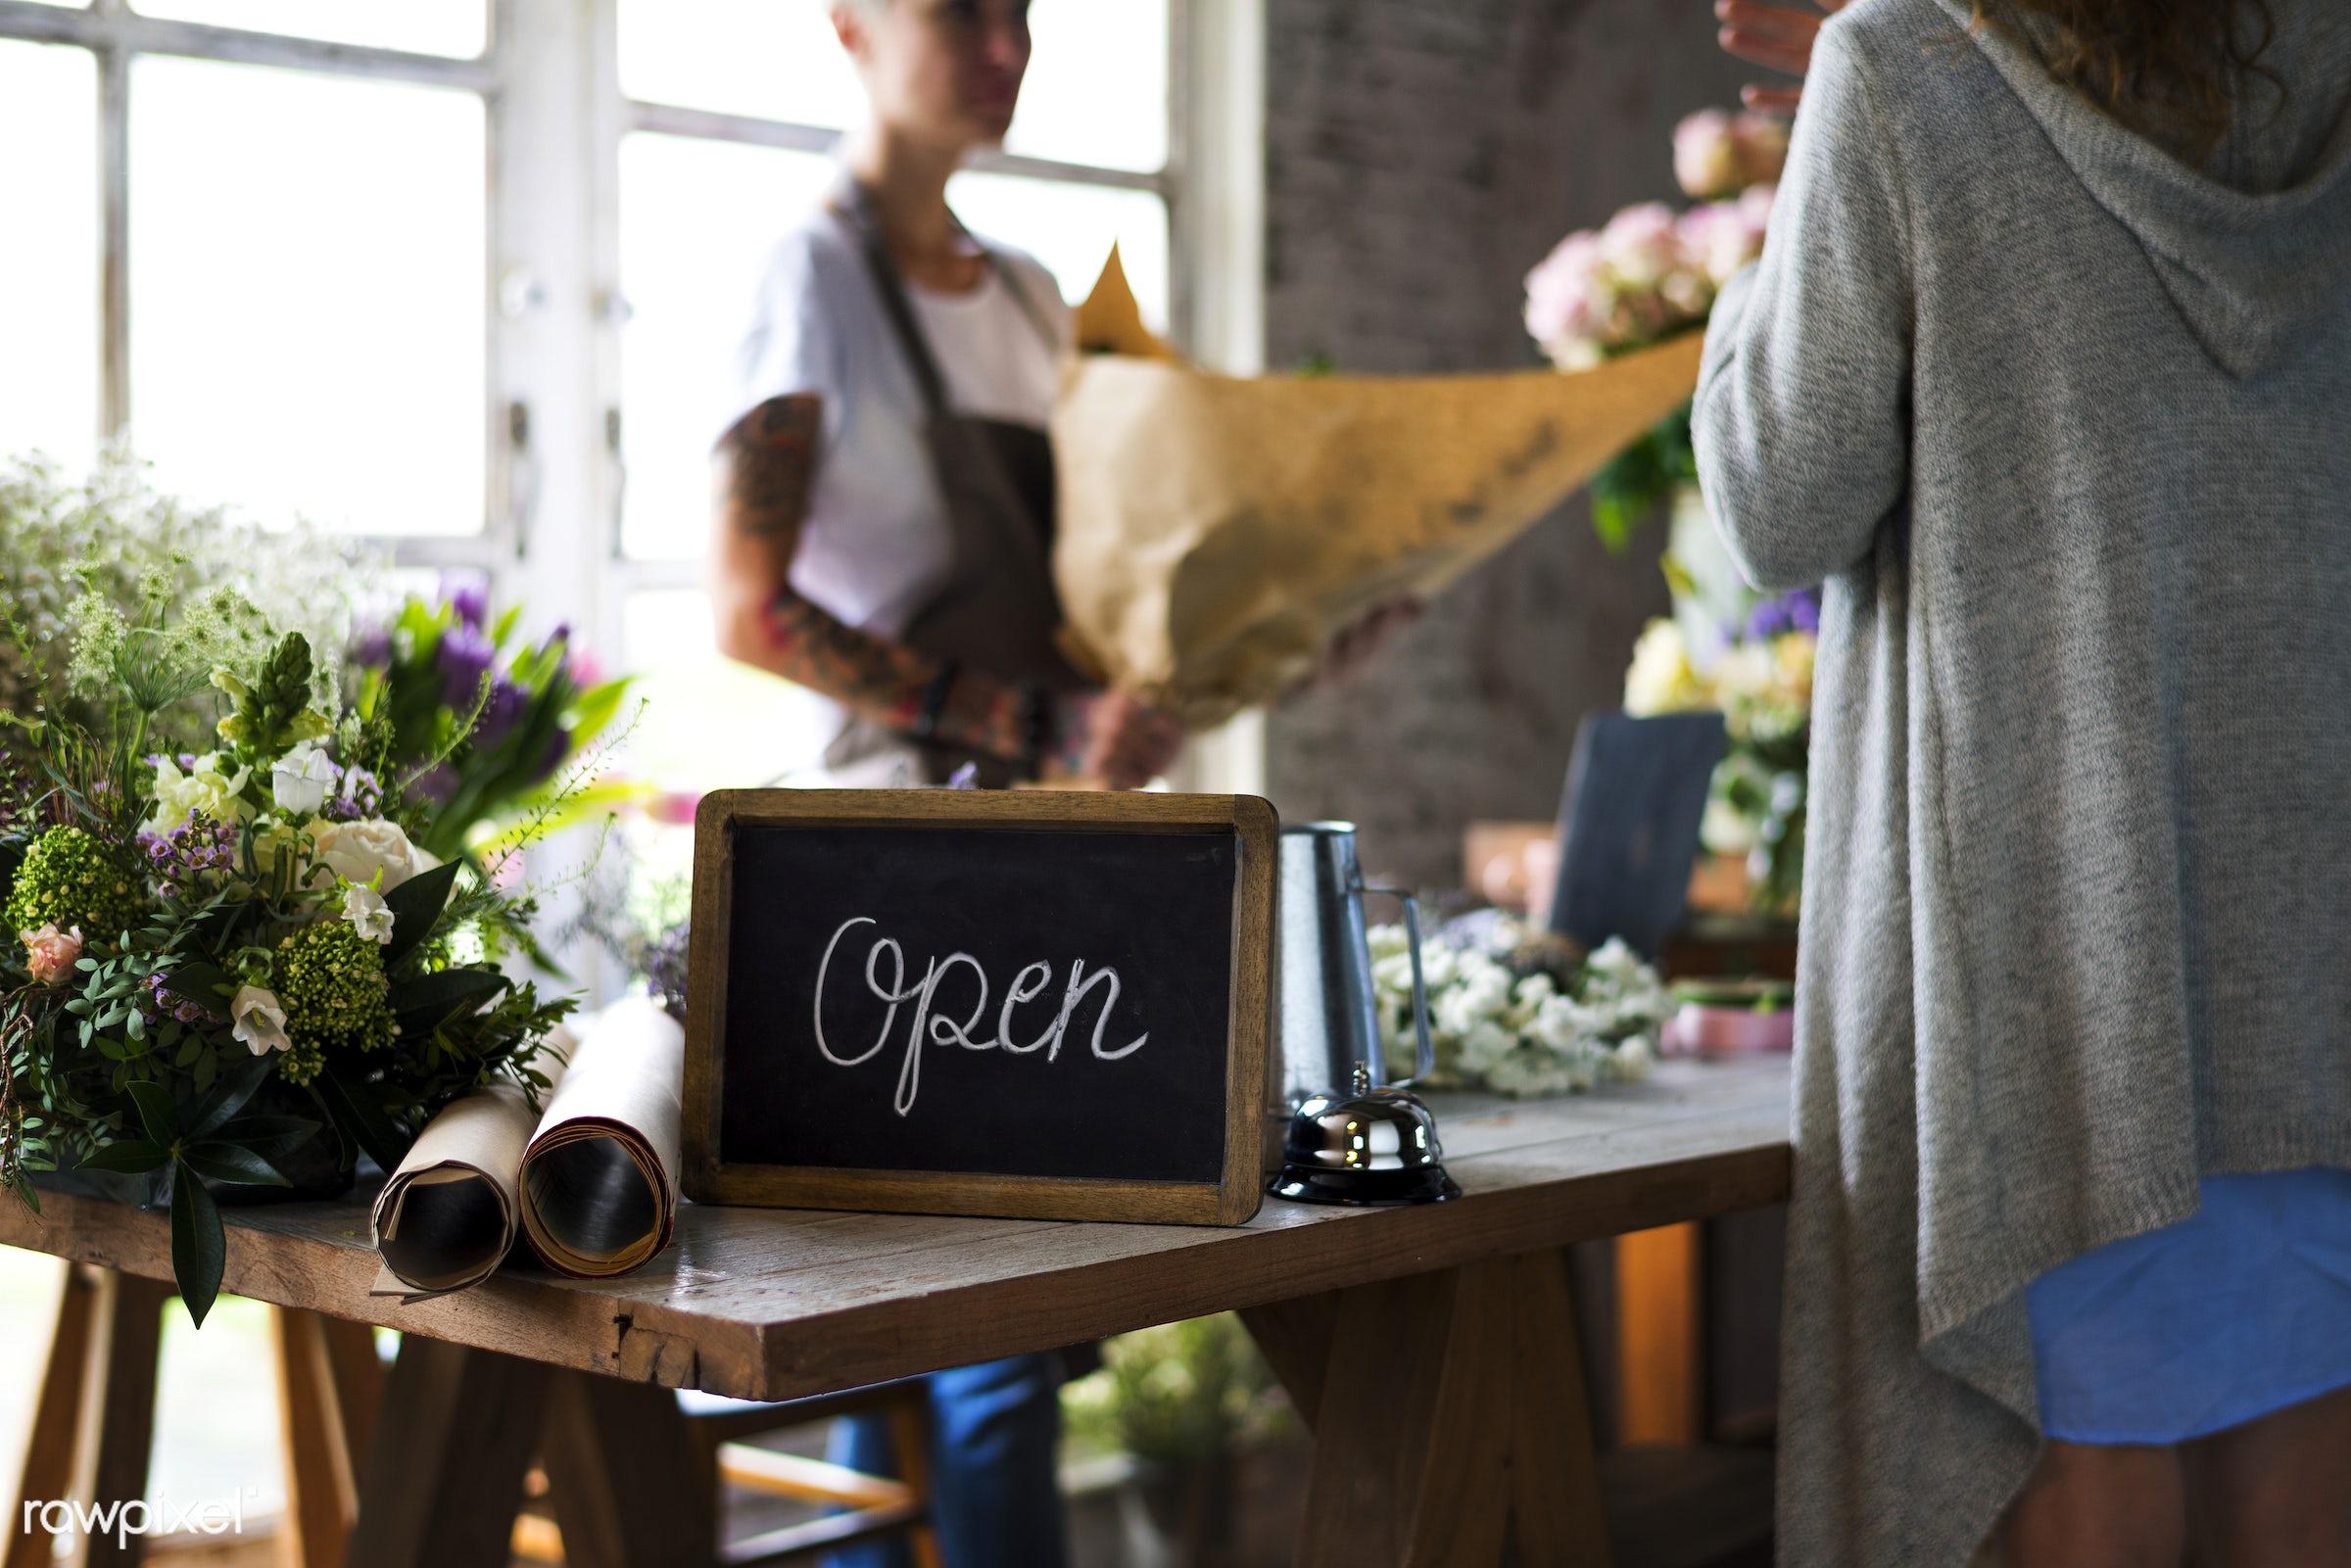 bouquet, shop, detail, person, customer, decor, nature, woman, tattoo, flowers, work, refreshment, florist, present,...